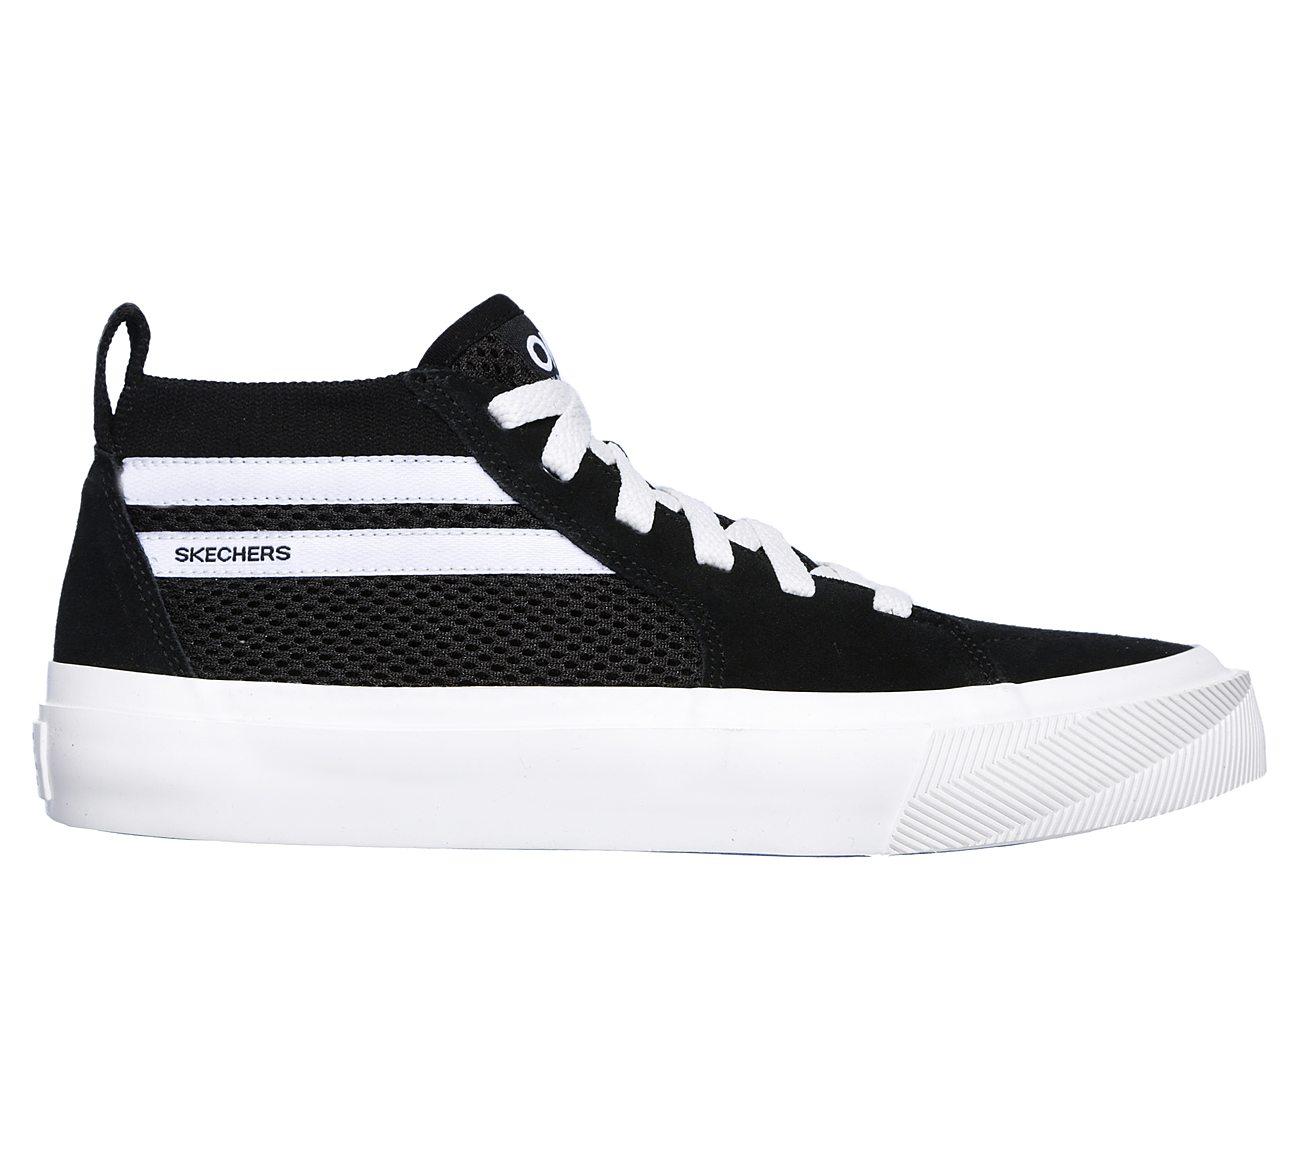 8c09f61b2f293 Buy SKECHERS Skechers ONE Champ Ultra Skechers Performance Shoes ...